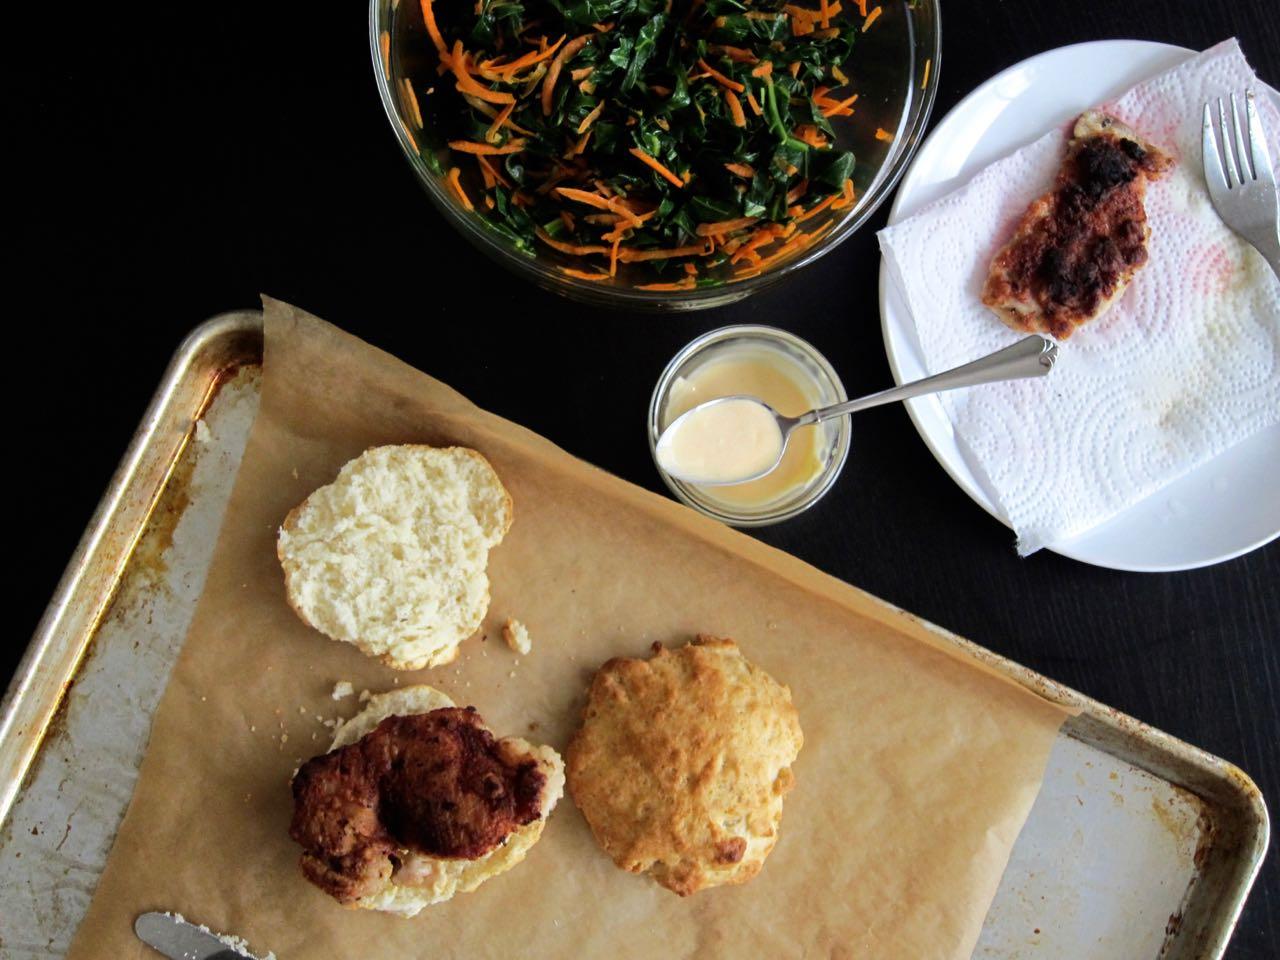 Building a fried chicken biscuit sandwich